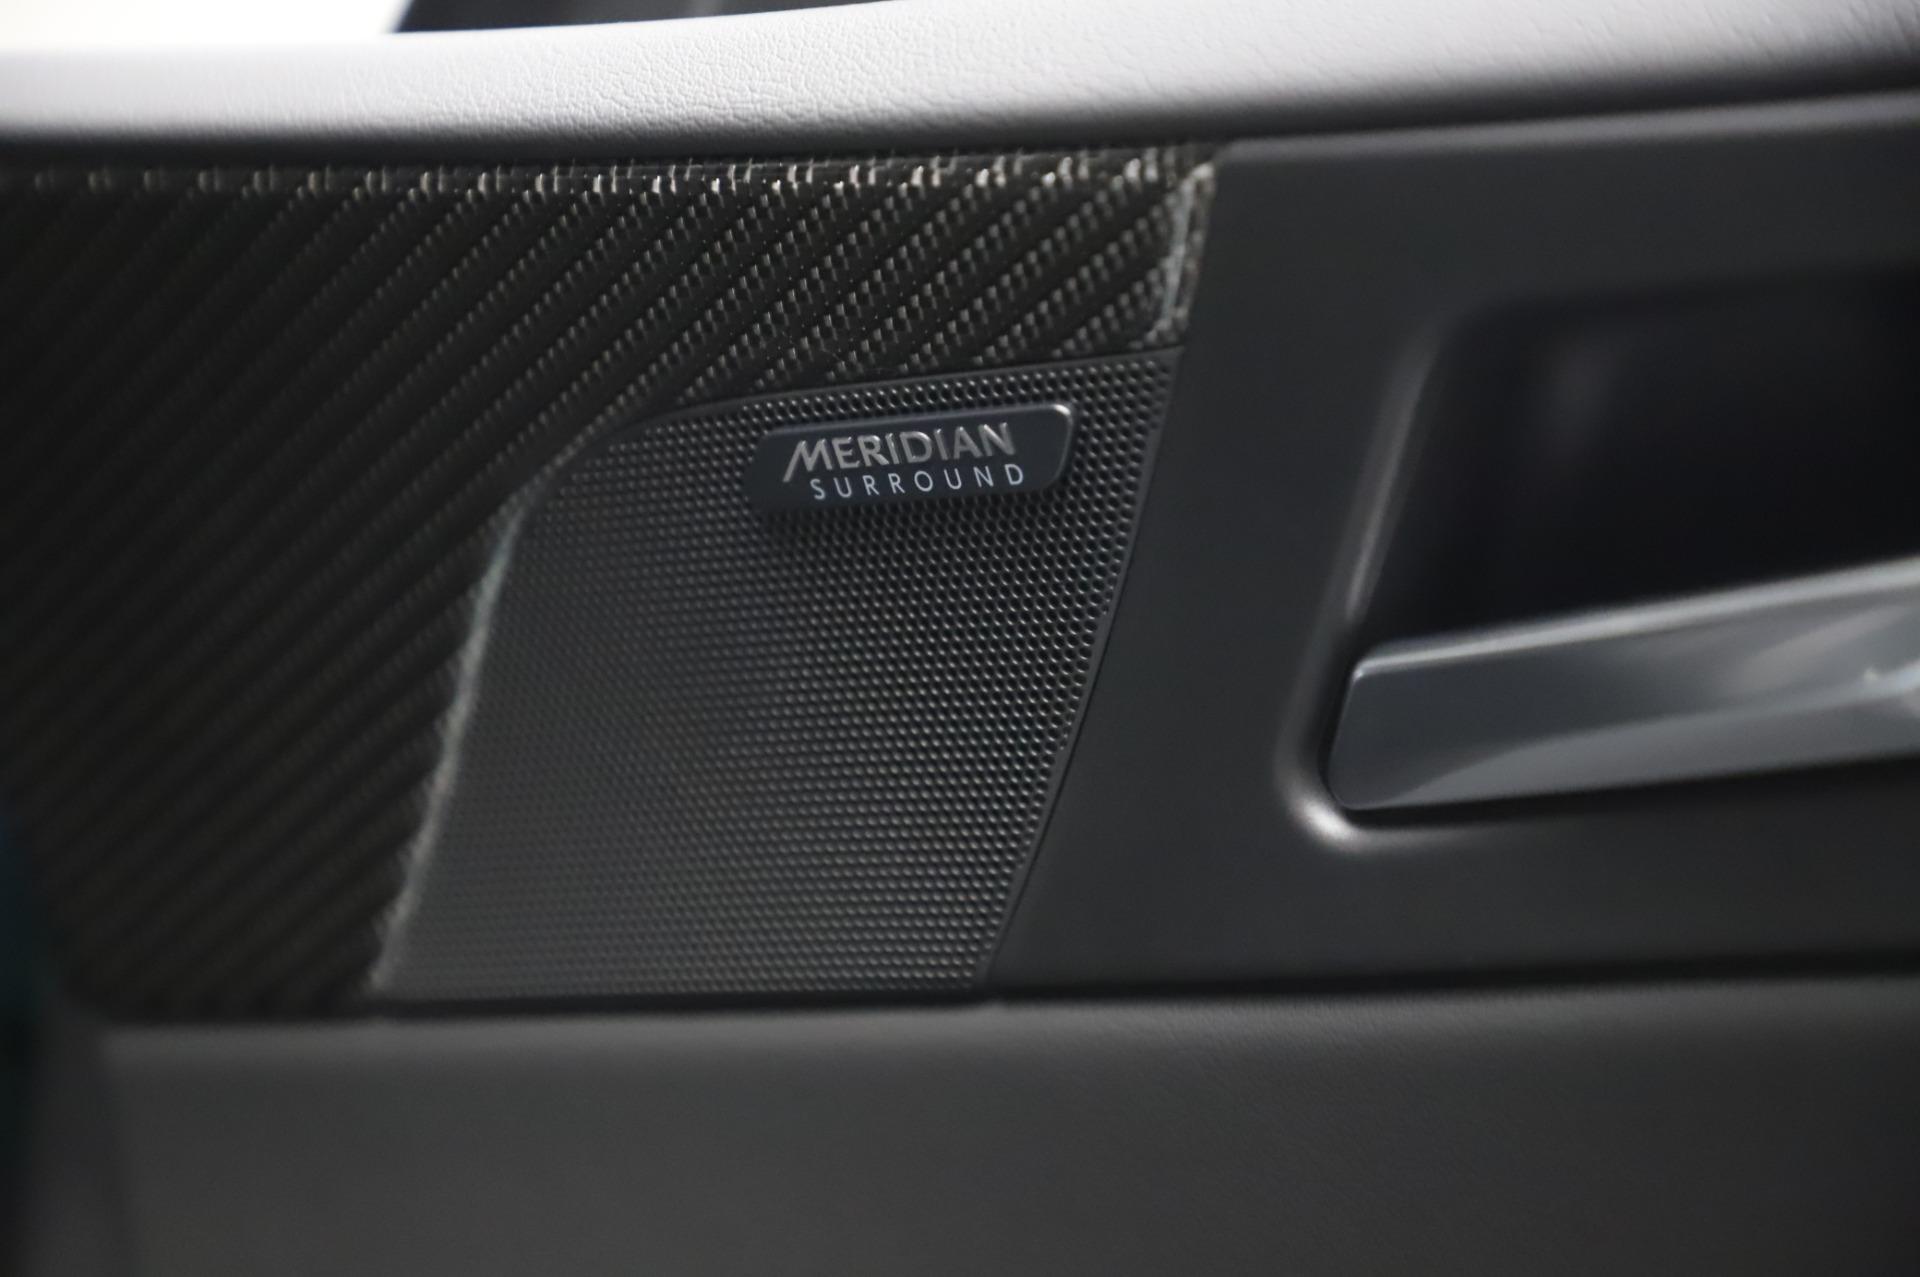 Pre Owned 2019 Jaguar Xe Sv Project 8 For Sale Miller Motorcars Stock 7918